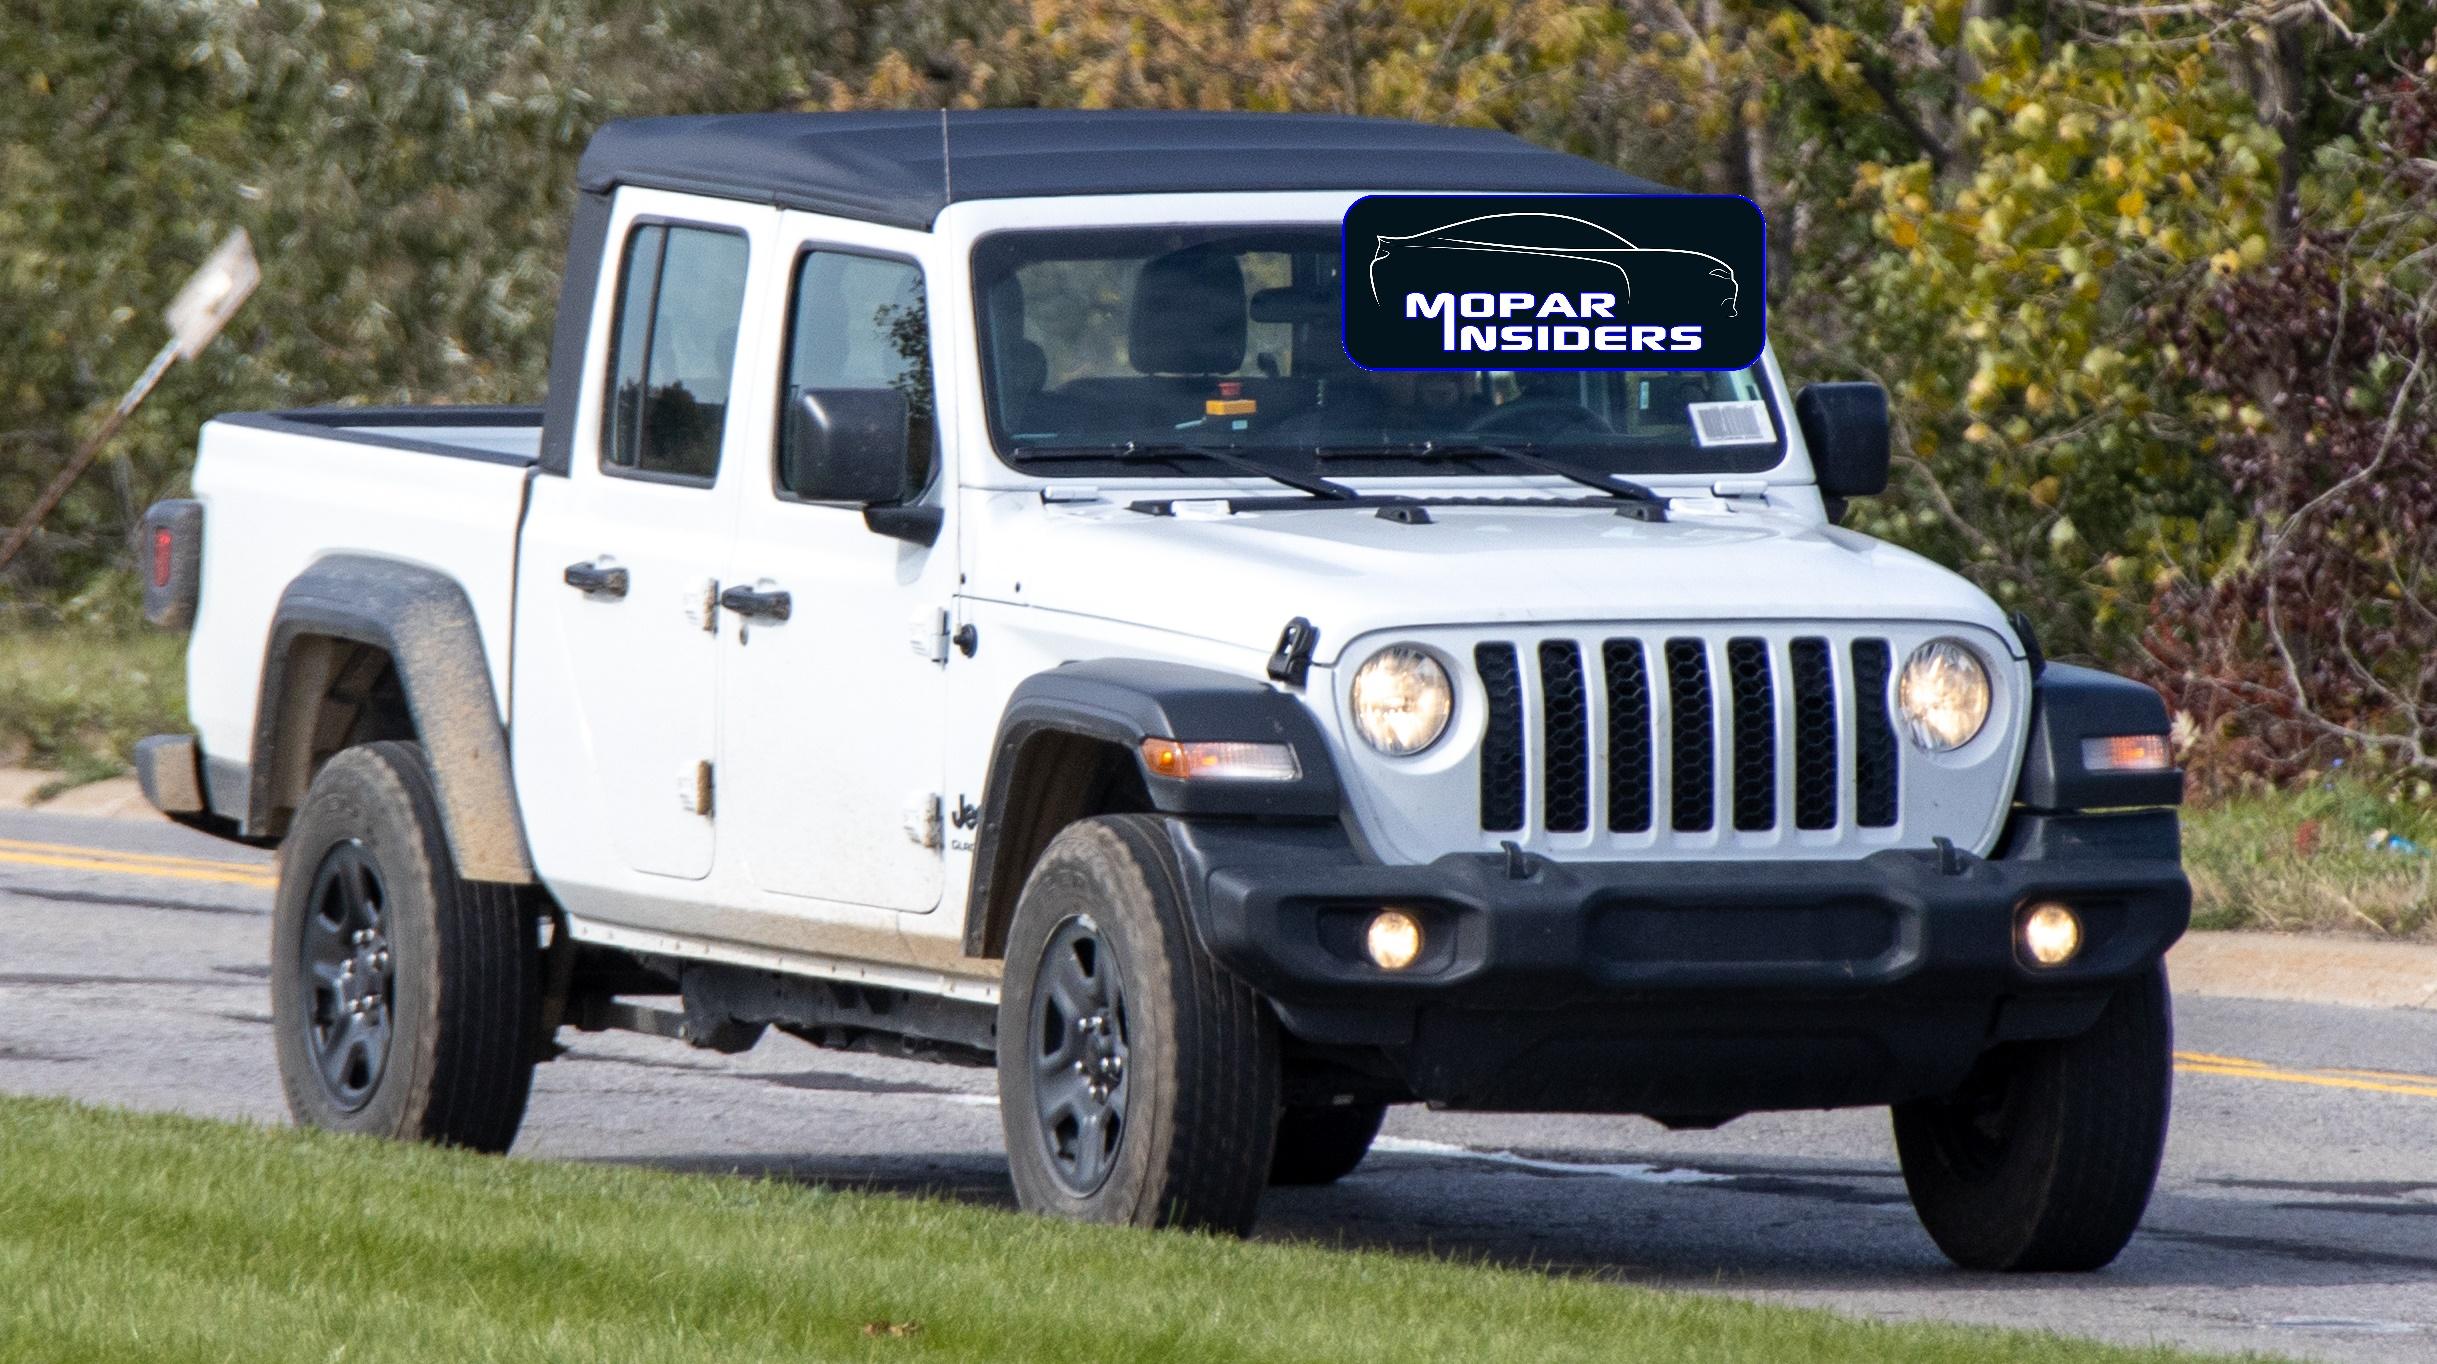 Spotted 2020 Jeep Gladiator Sport Ecodiesel Mopar Insiders